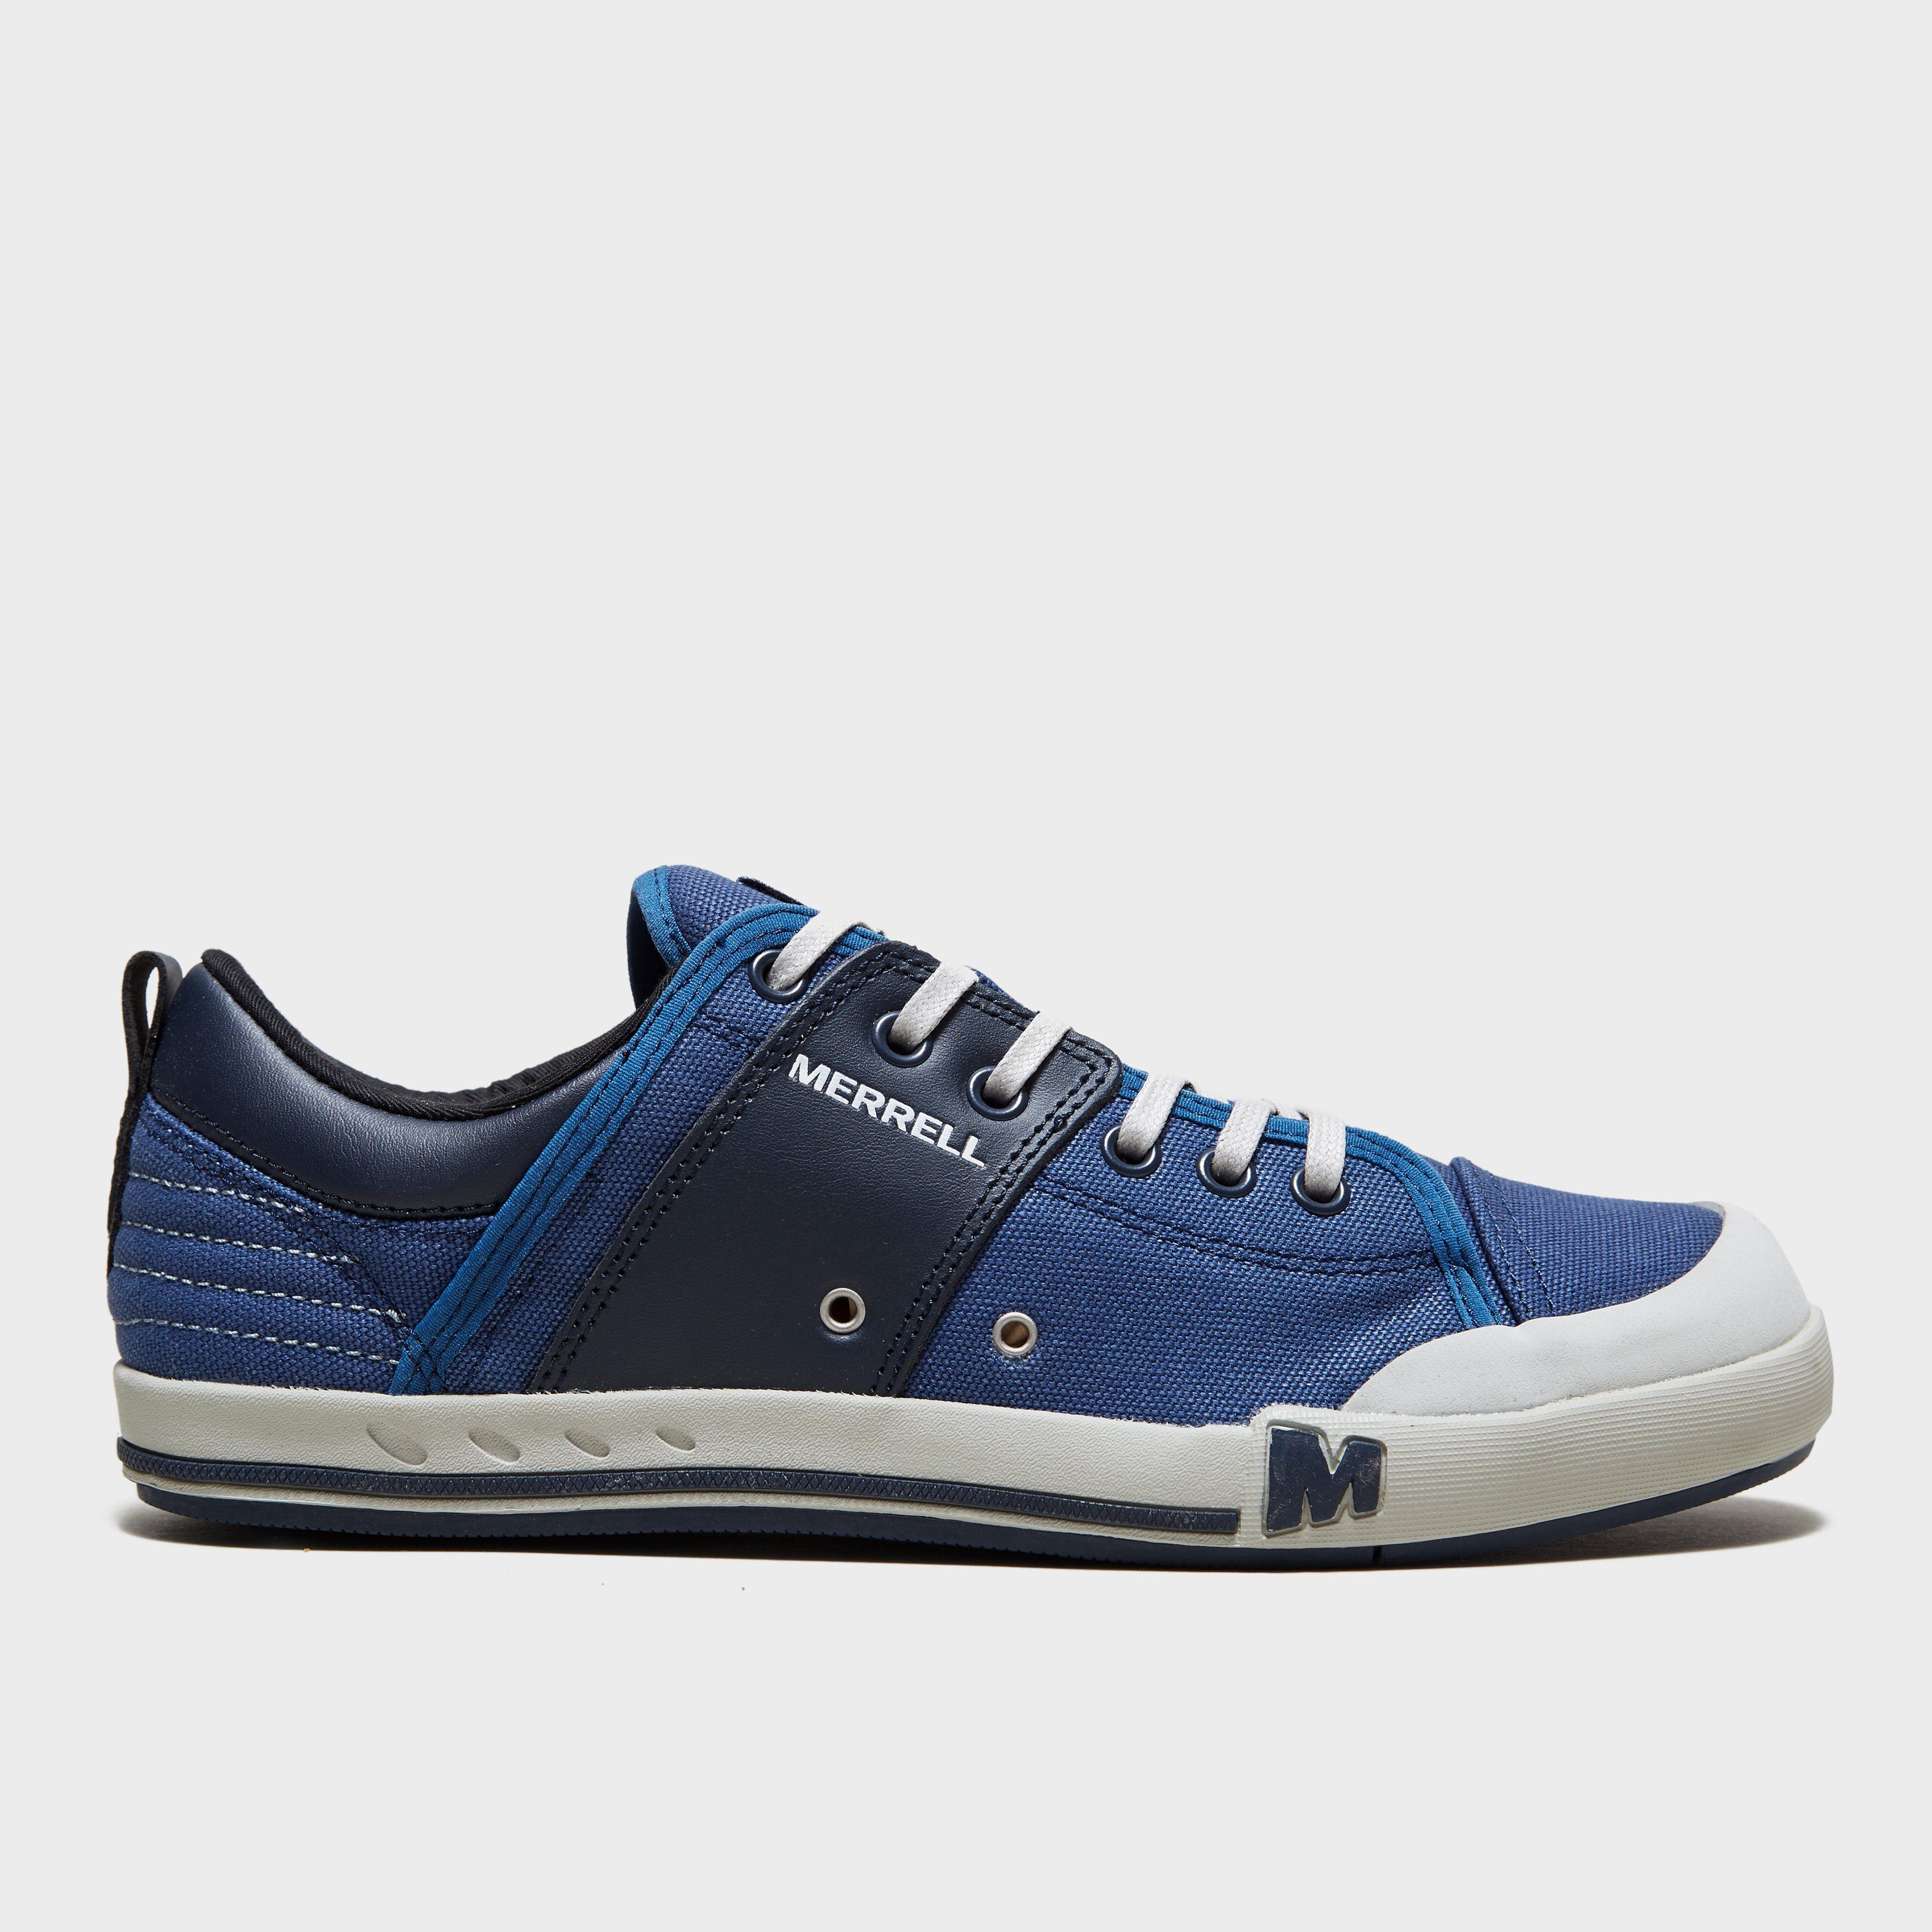 MERRELL Men's Rant Shoe